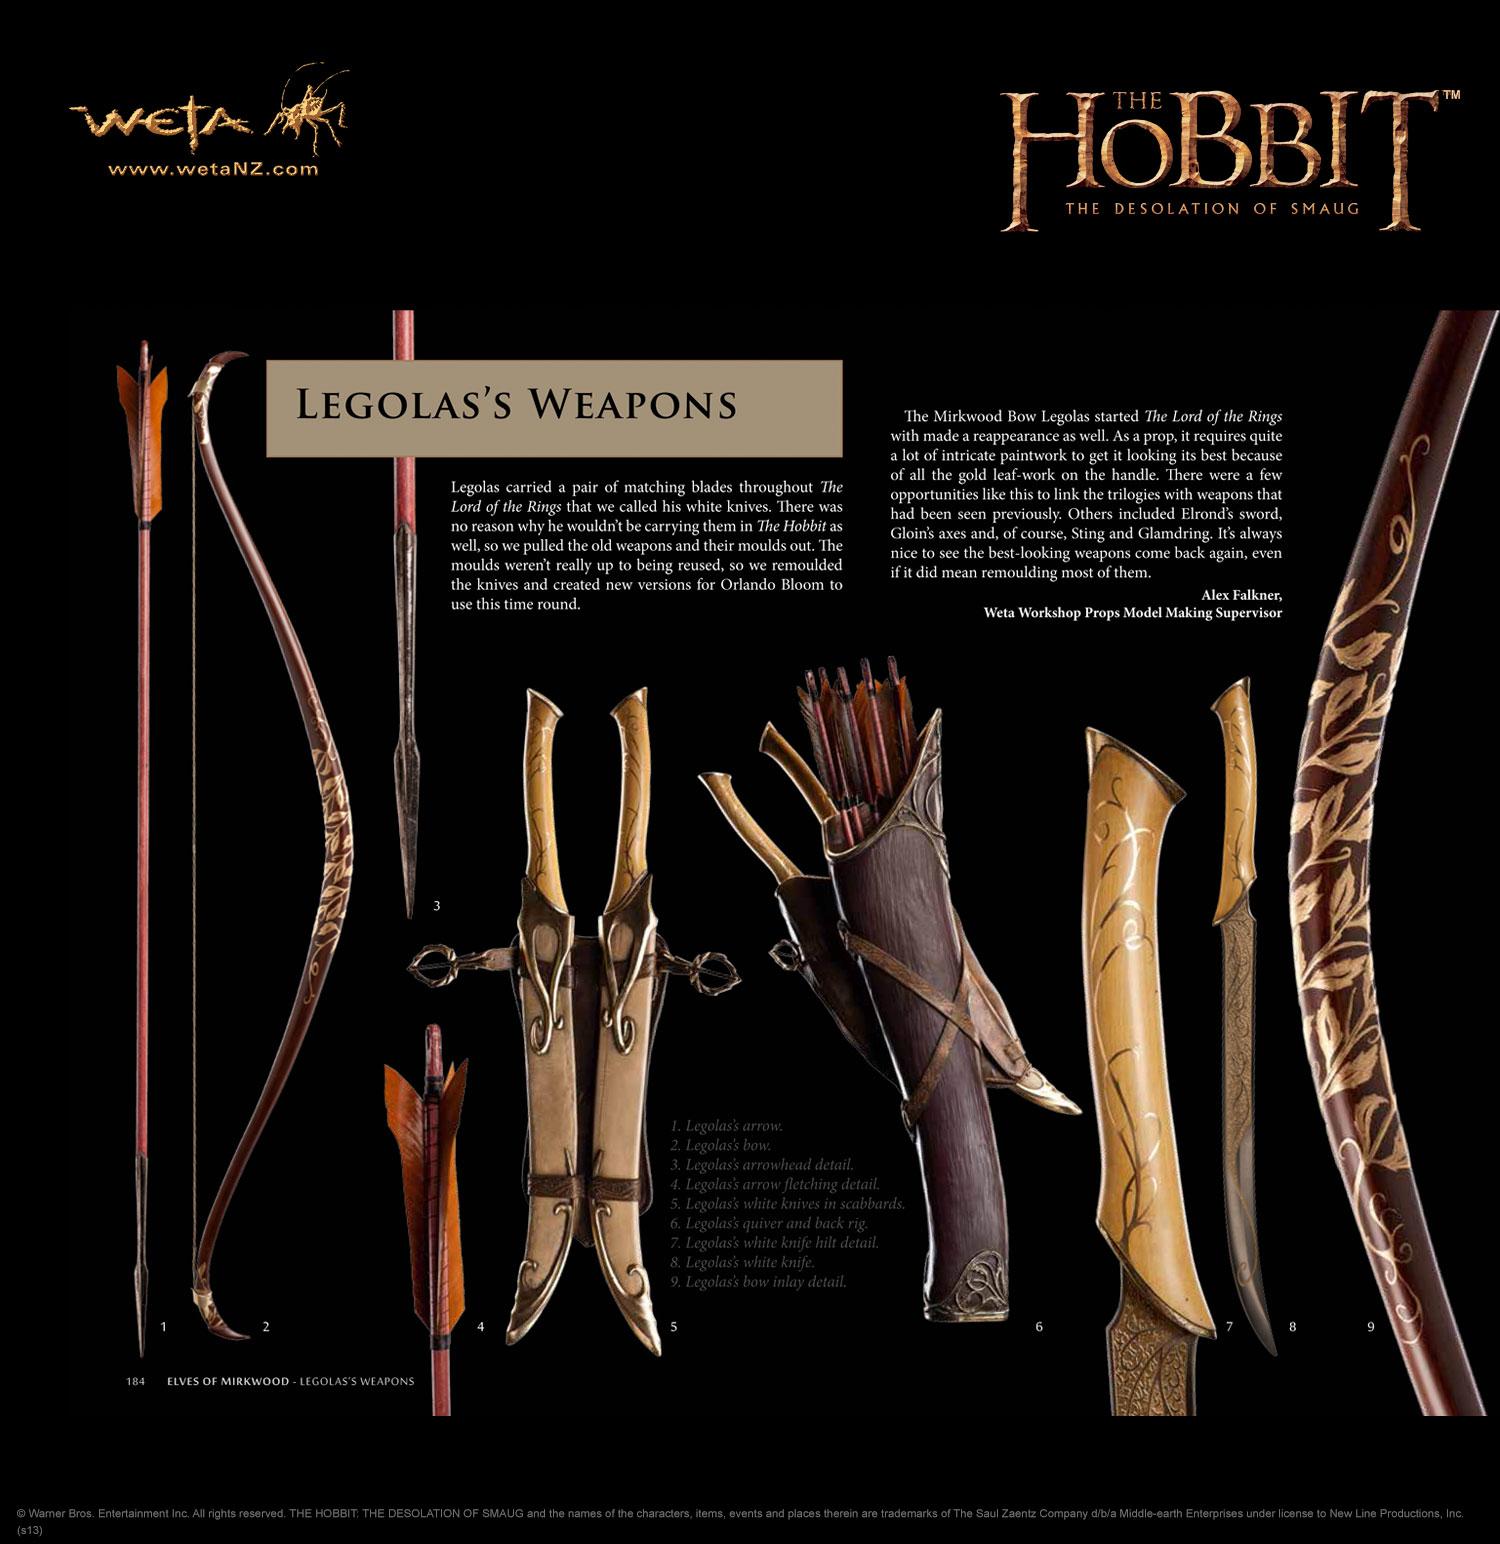 hobbit-chroniclesDoSCloaksDaggersf3